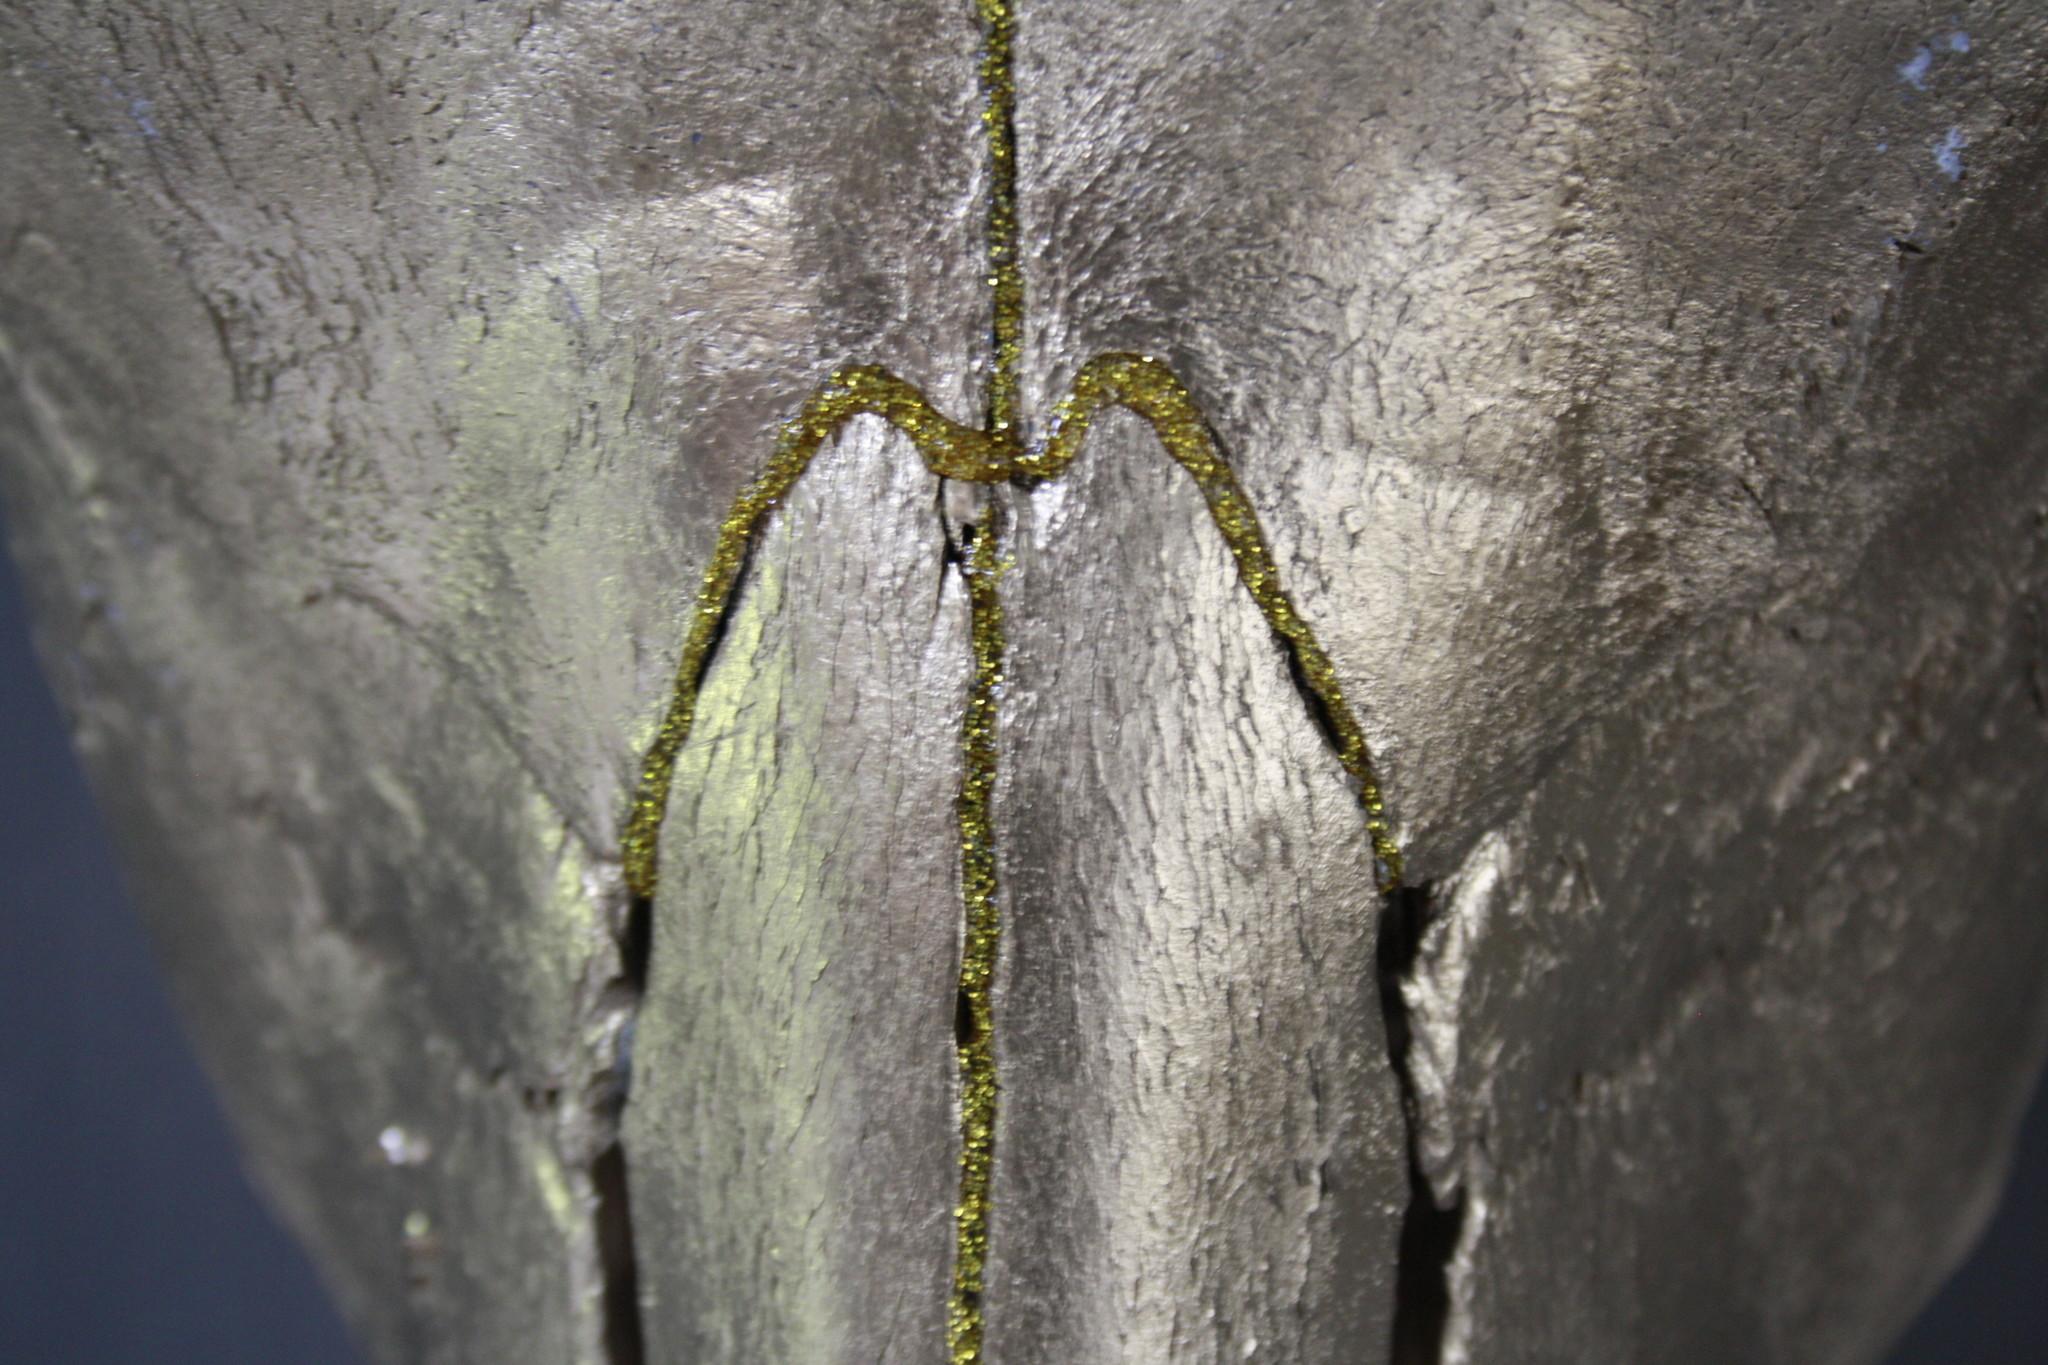 Longhorn Schedel Goud Met Hoorns 63 x 44 cm - Copy-6